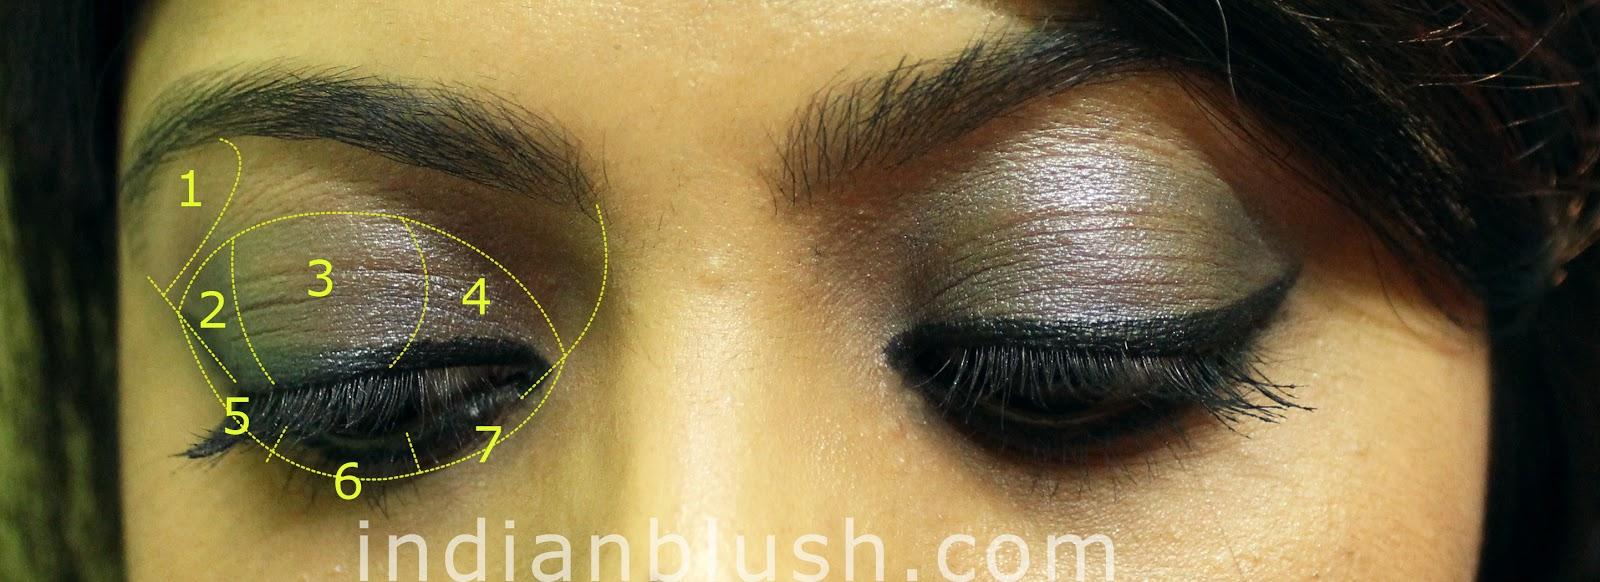 Easy ways to do eye makeup